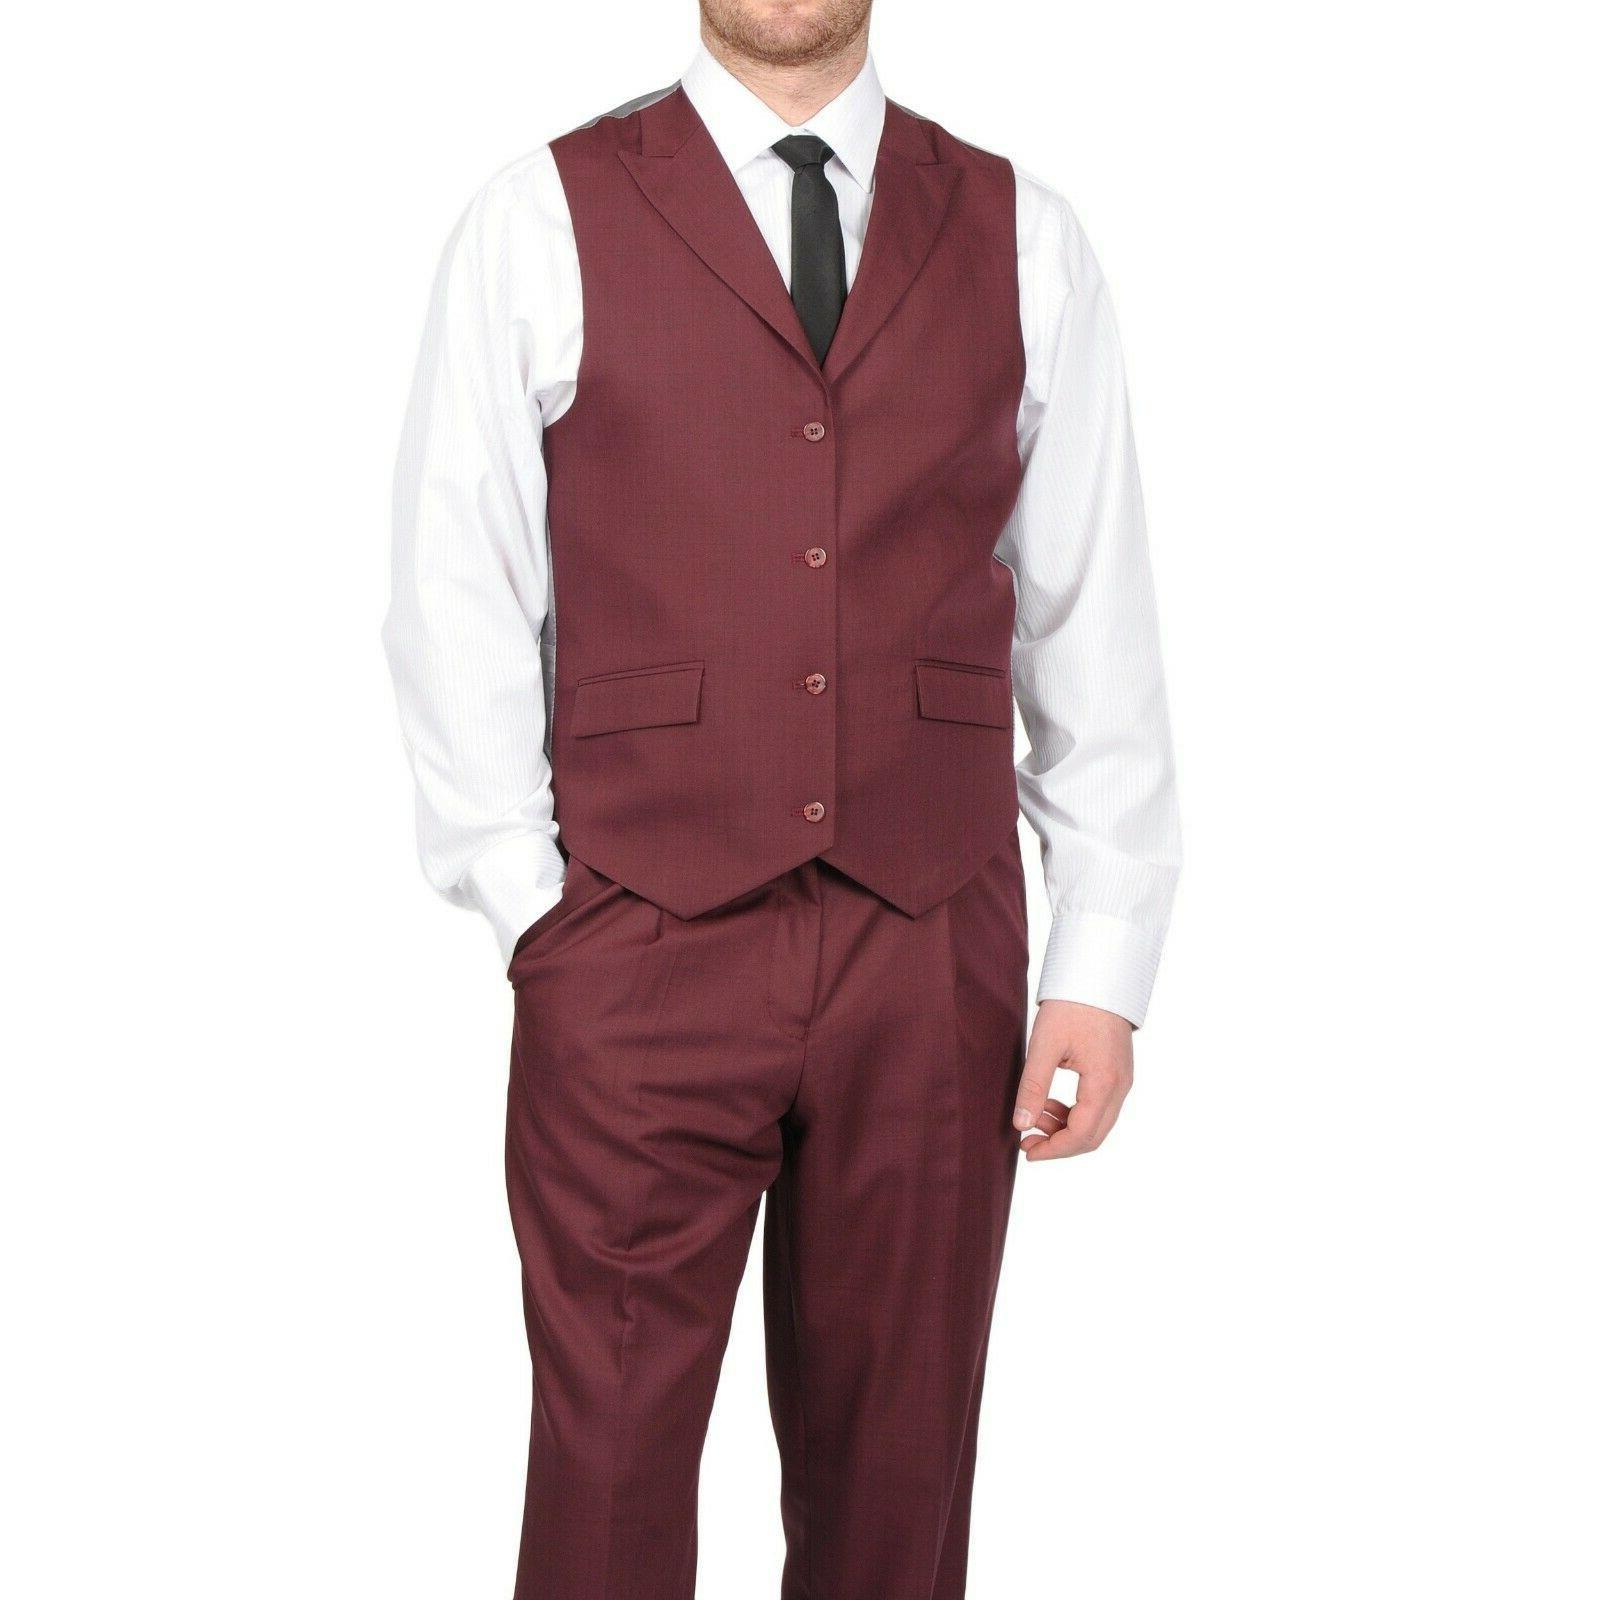 Brand Burgundy Suit 38R, 29R